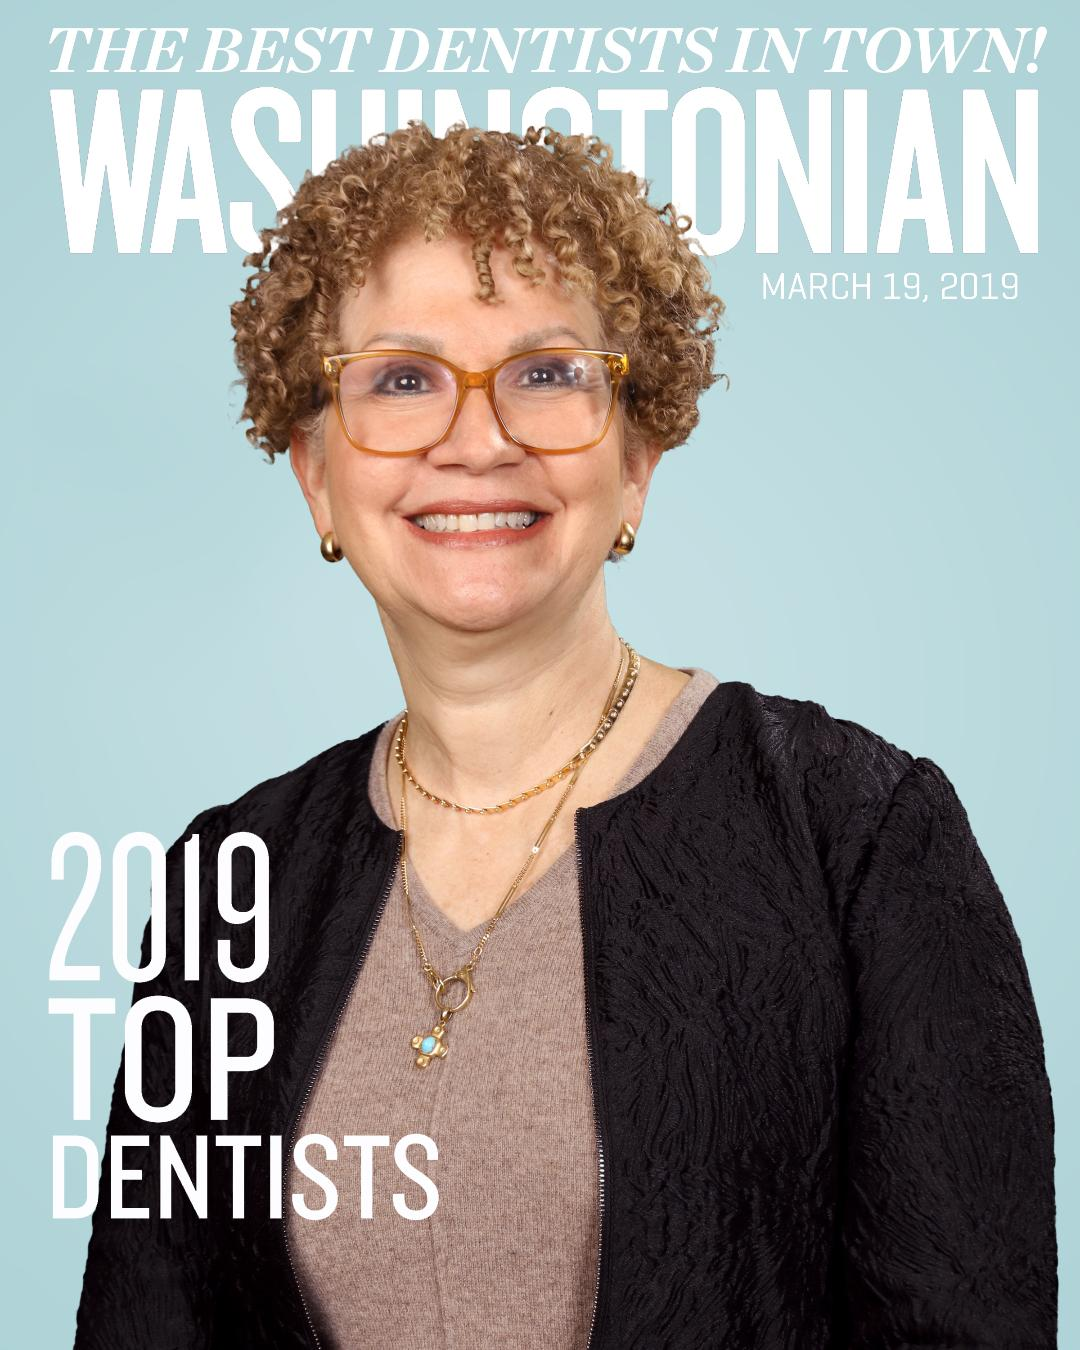 """TOP ENDODONTIST"" IN March 2019 Washingtonian!"